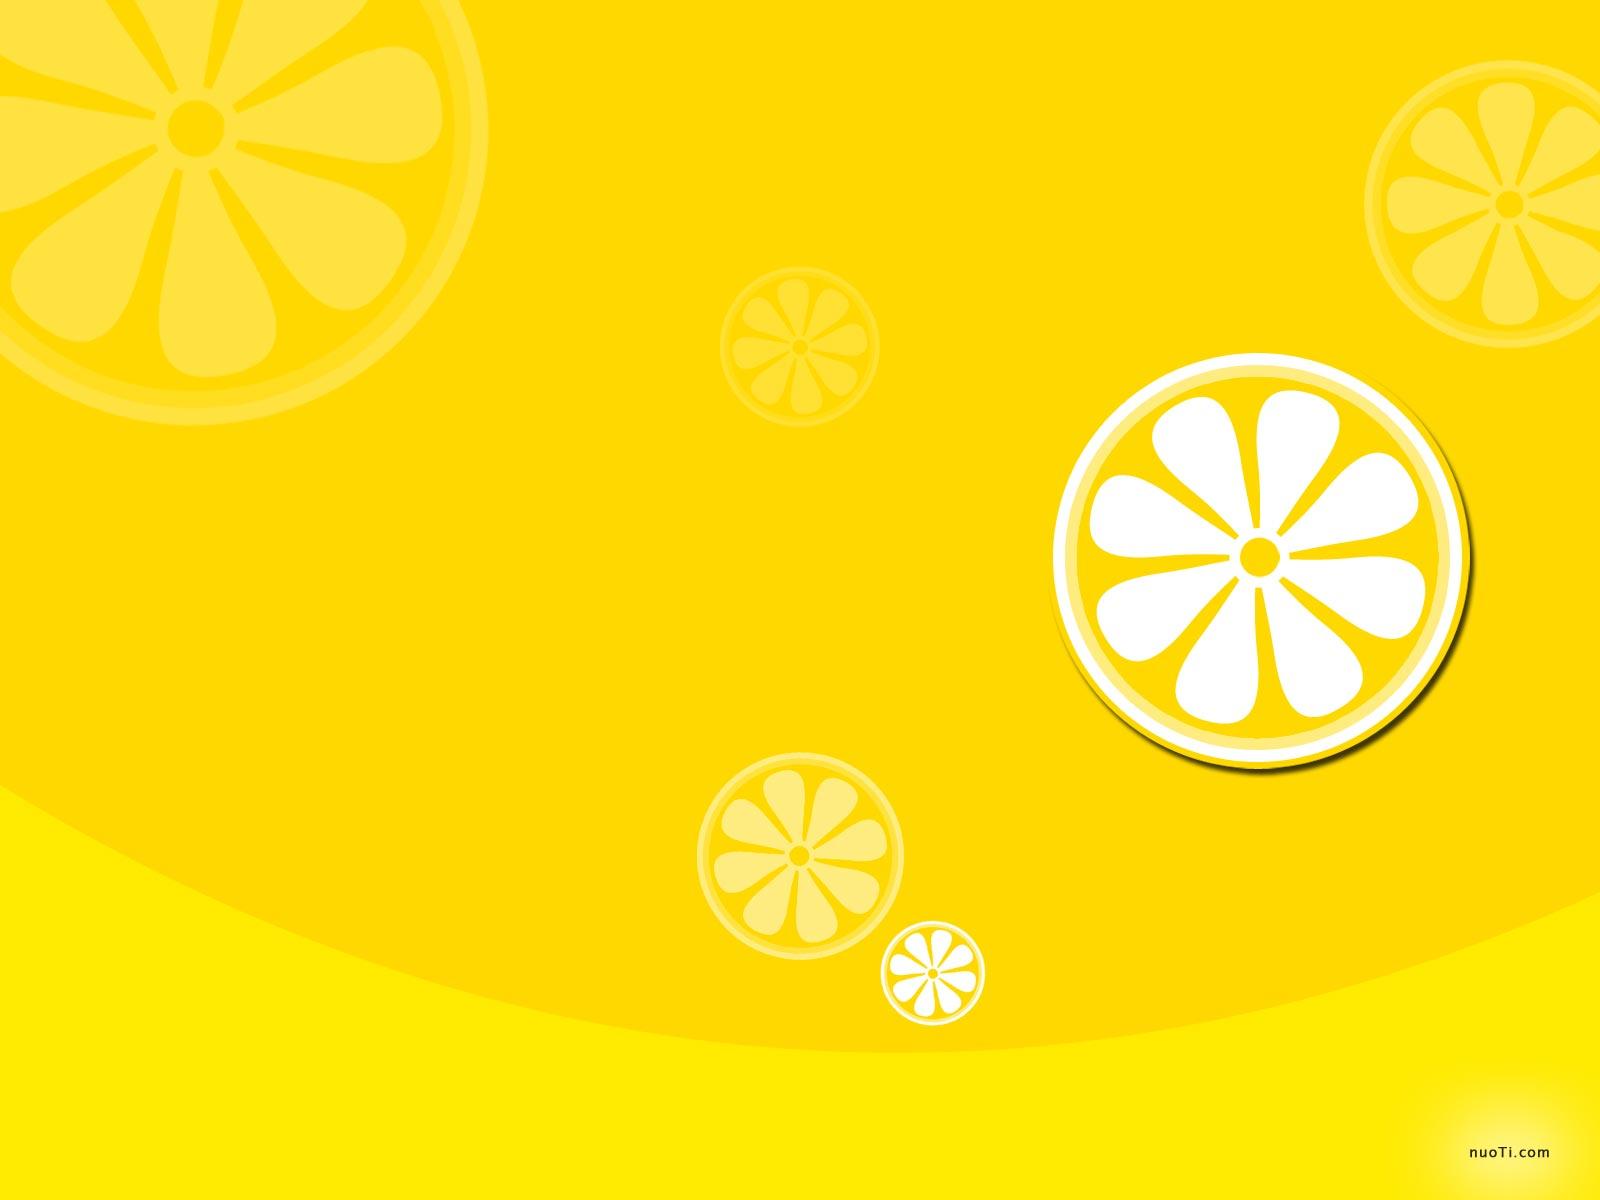 top desktop yellow wallpapers yellow wallpaper yellow background hd 10 1600x1200